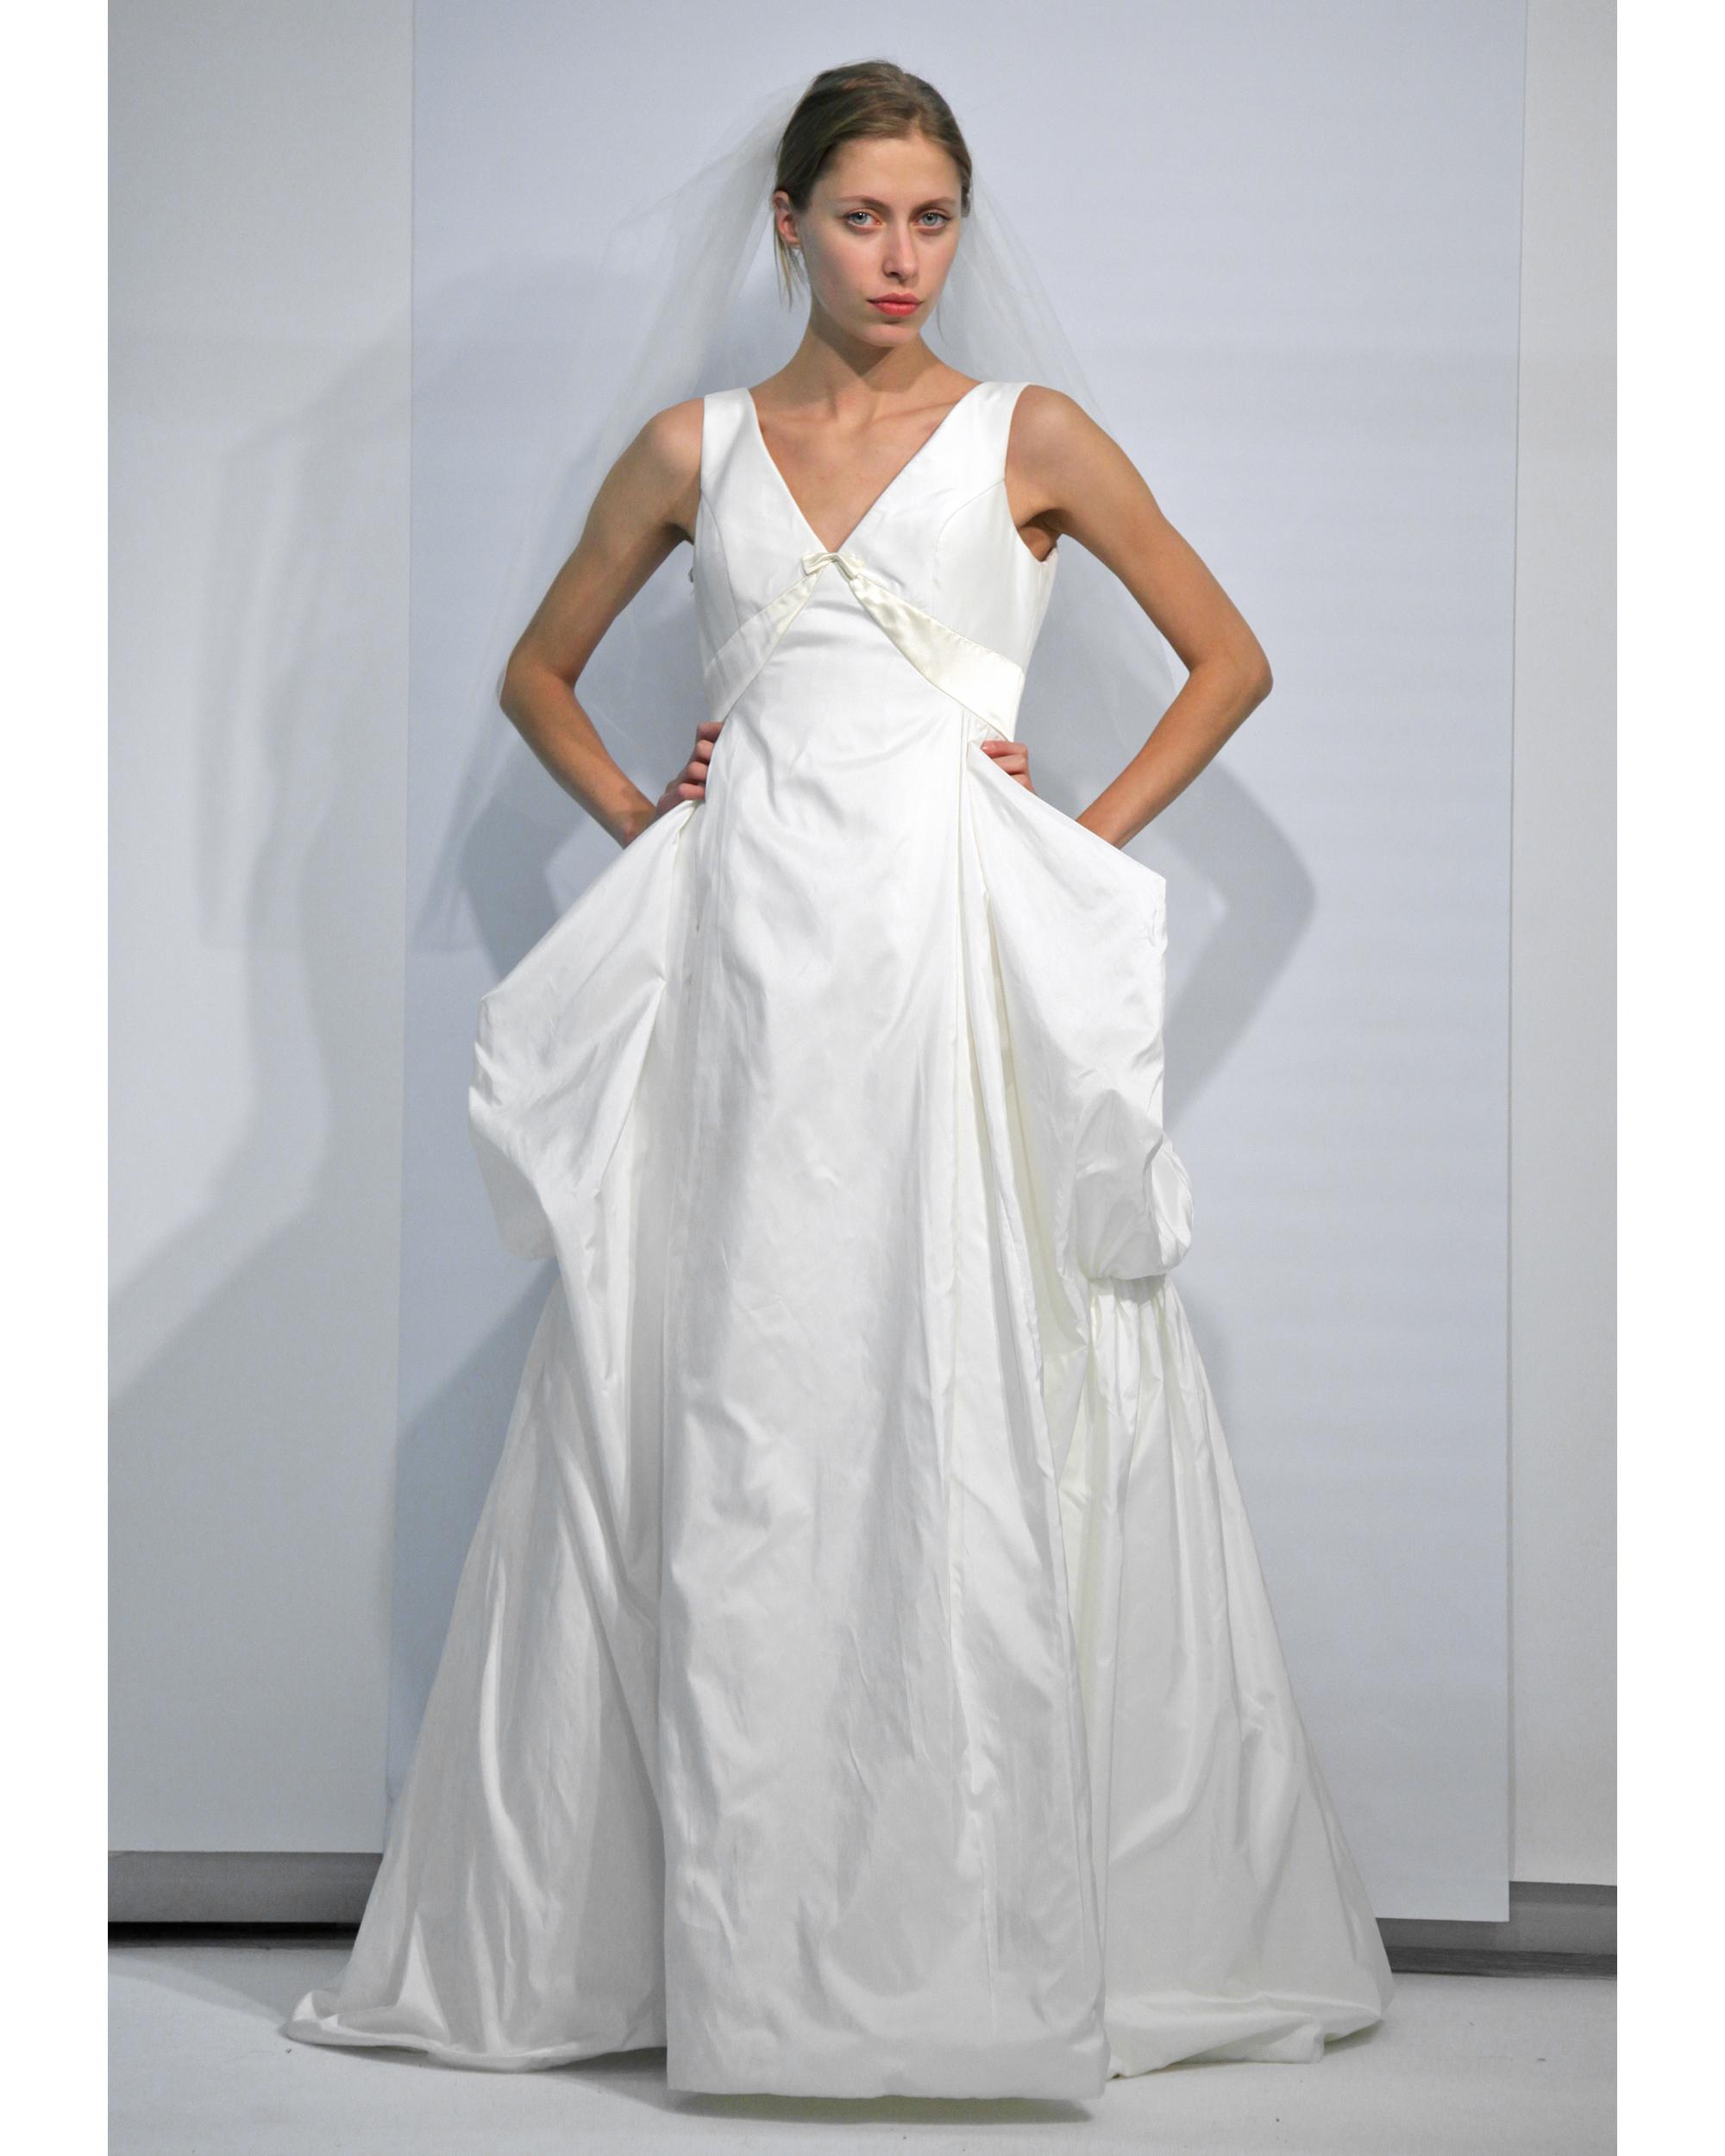 justina-mccaffre-fall2012-wd108109-002.jpg